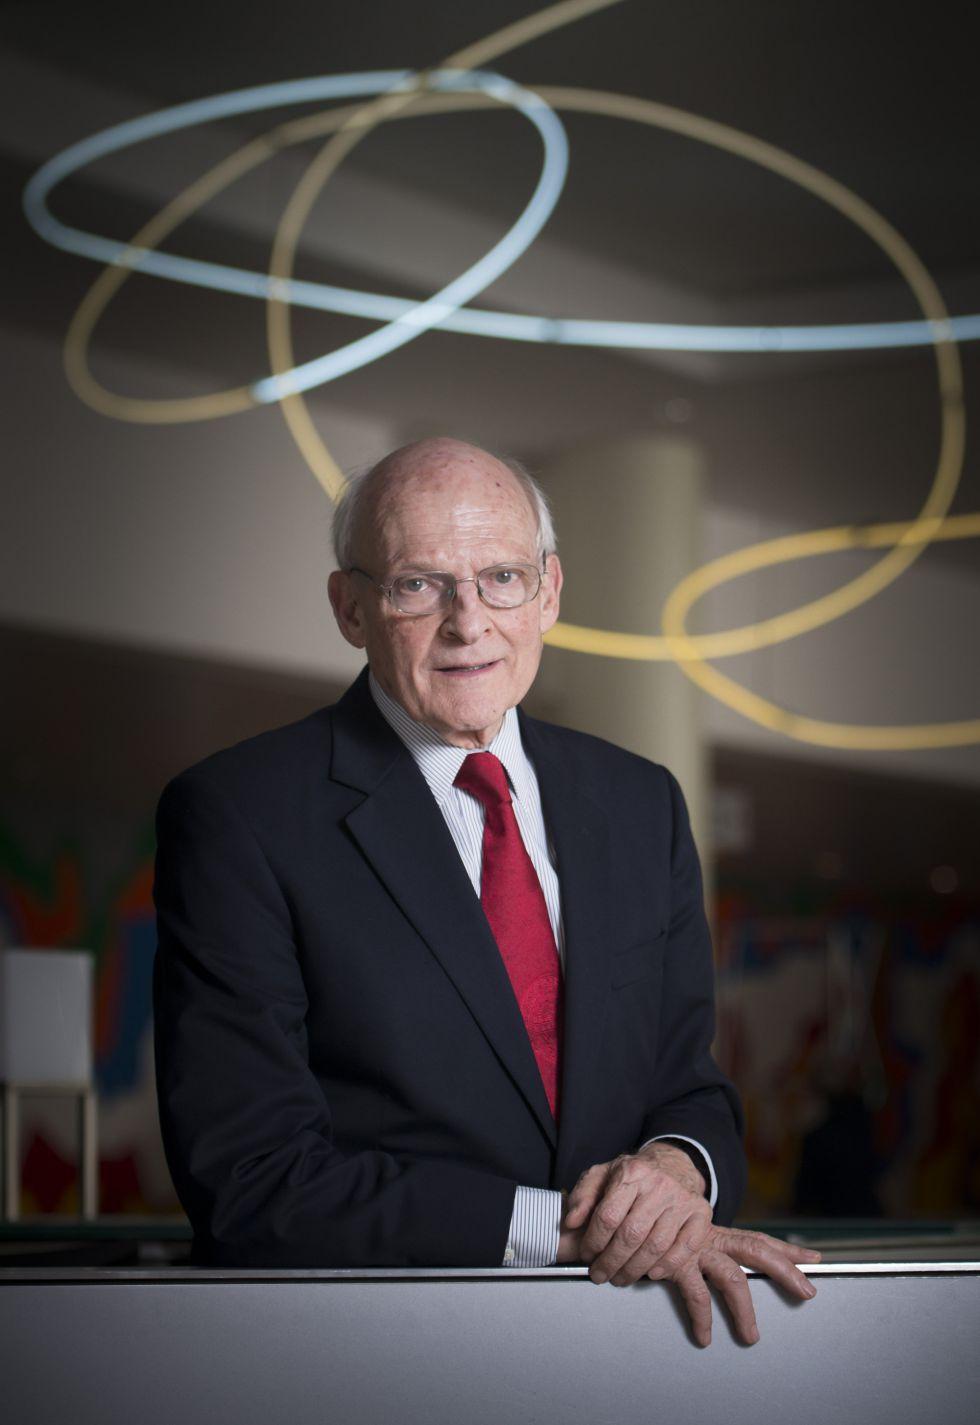 Dieter Söll